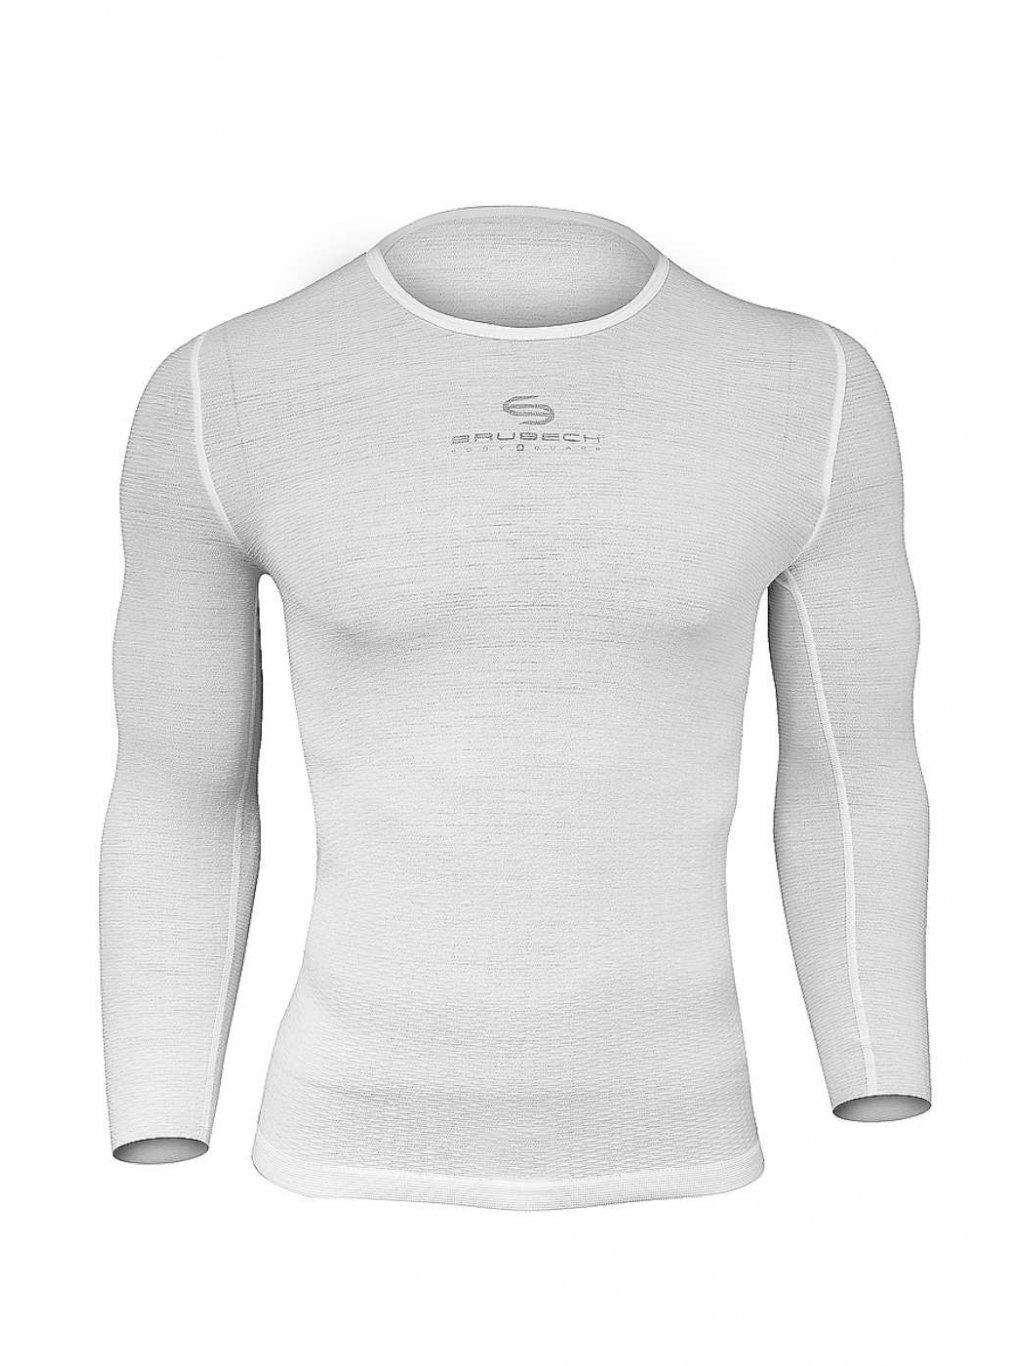 Brubeck UNISEX tričko s dlouhým rukávem Multifunctional